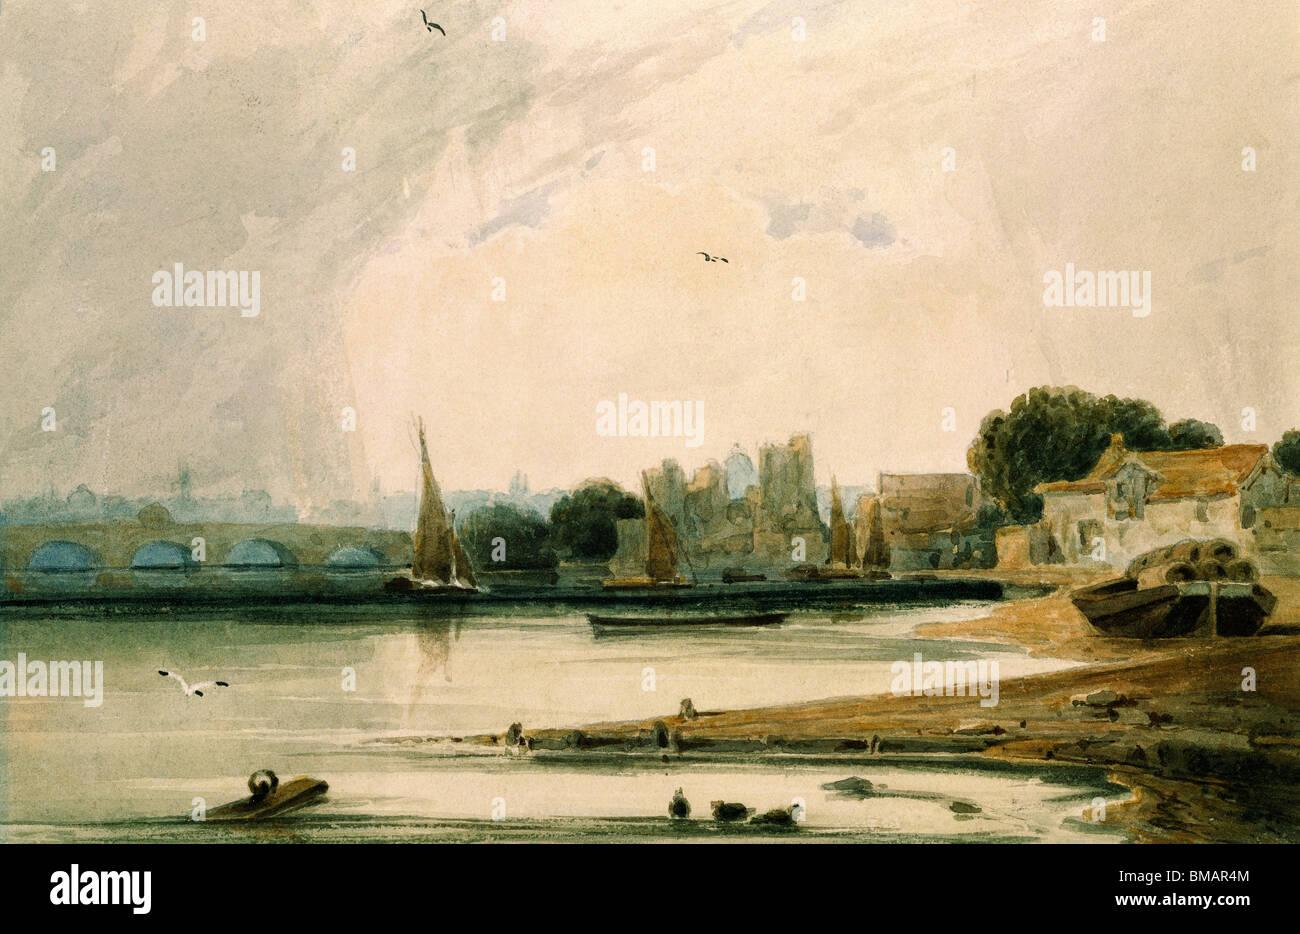 Lambeth Palace und Westminster Bridge, durch F.L.T. Francia. London, England, 19. Jahrhundert Stockfoto